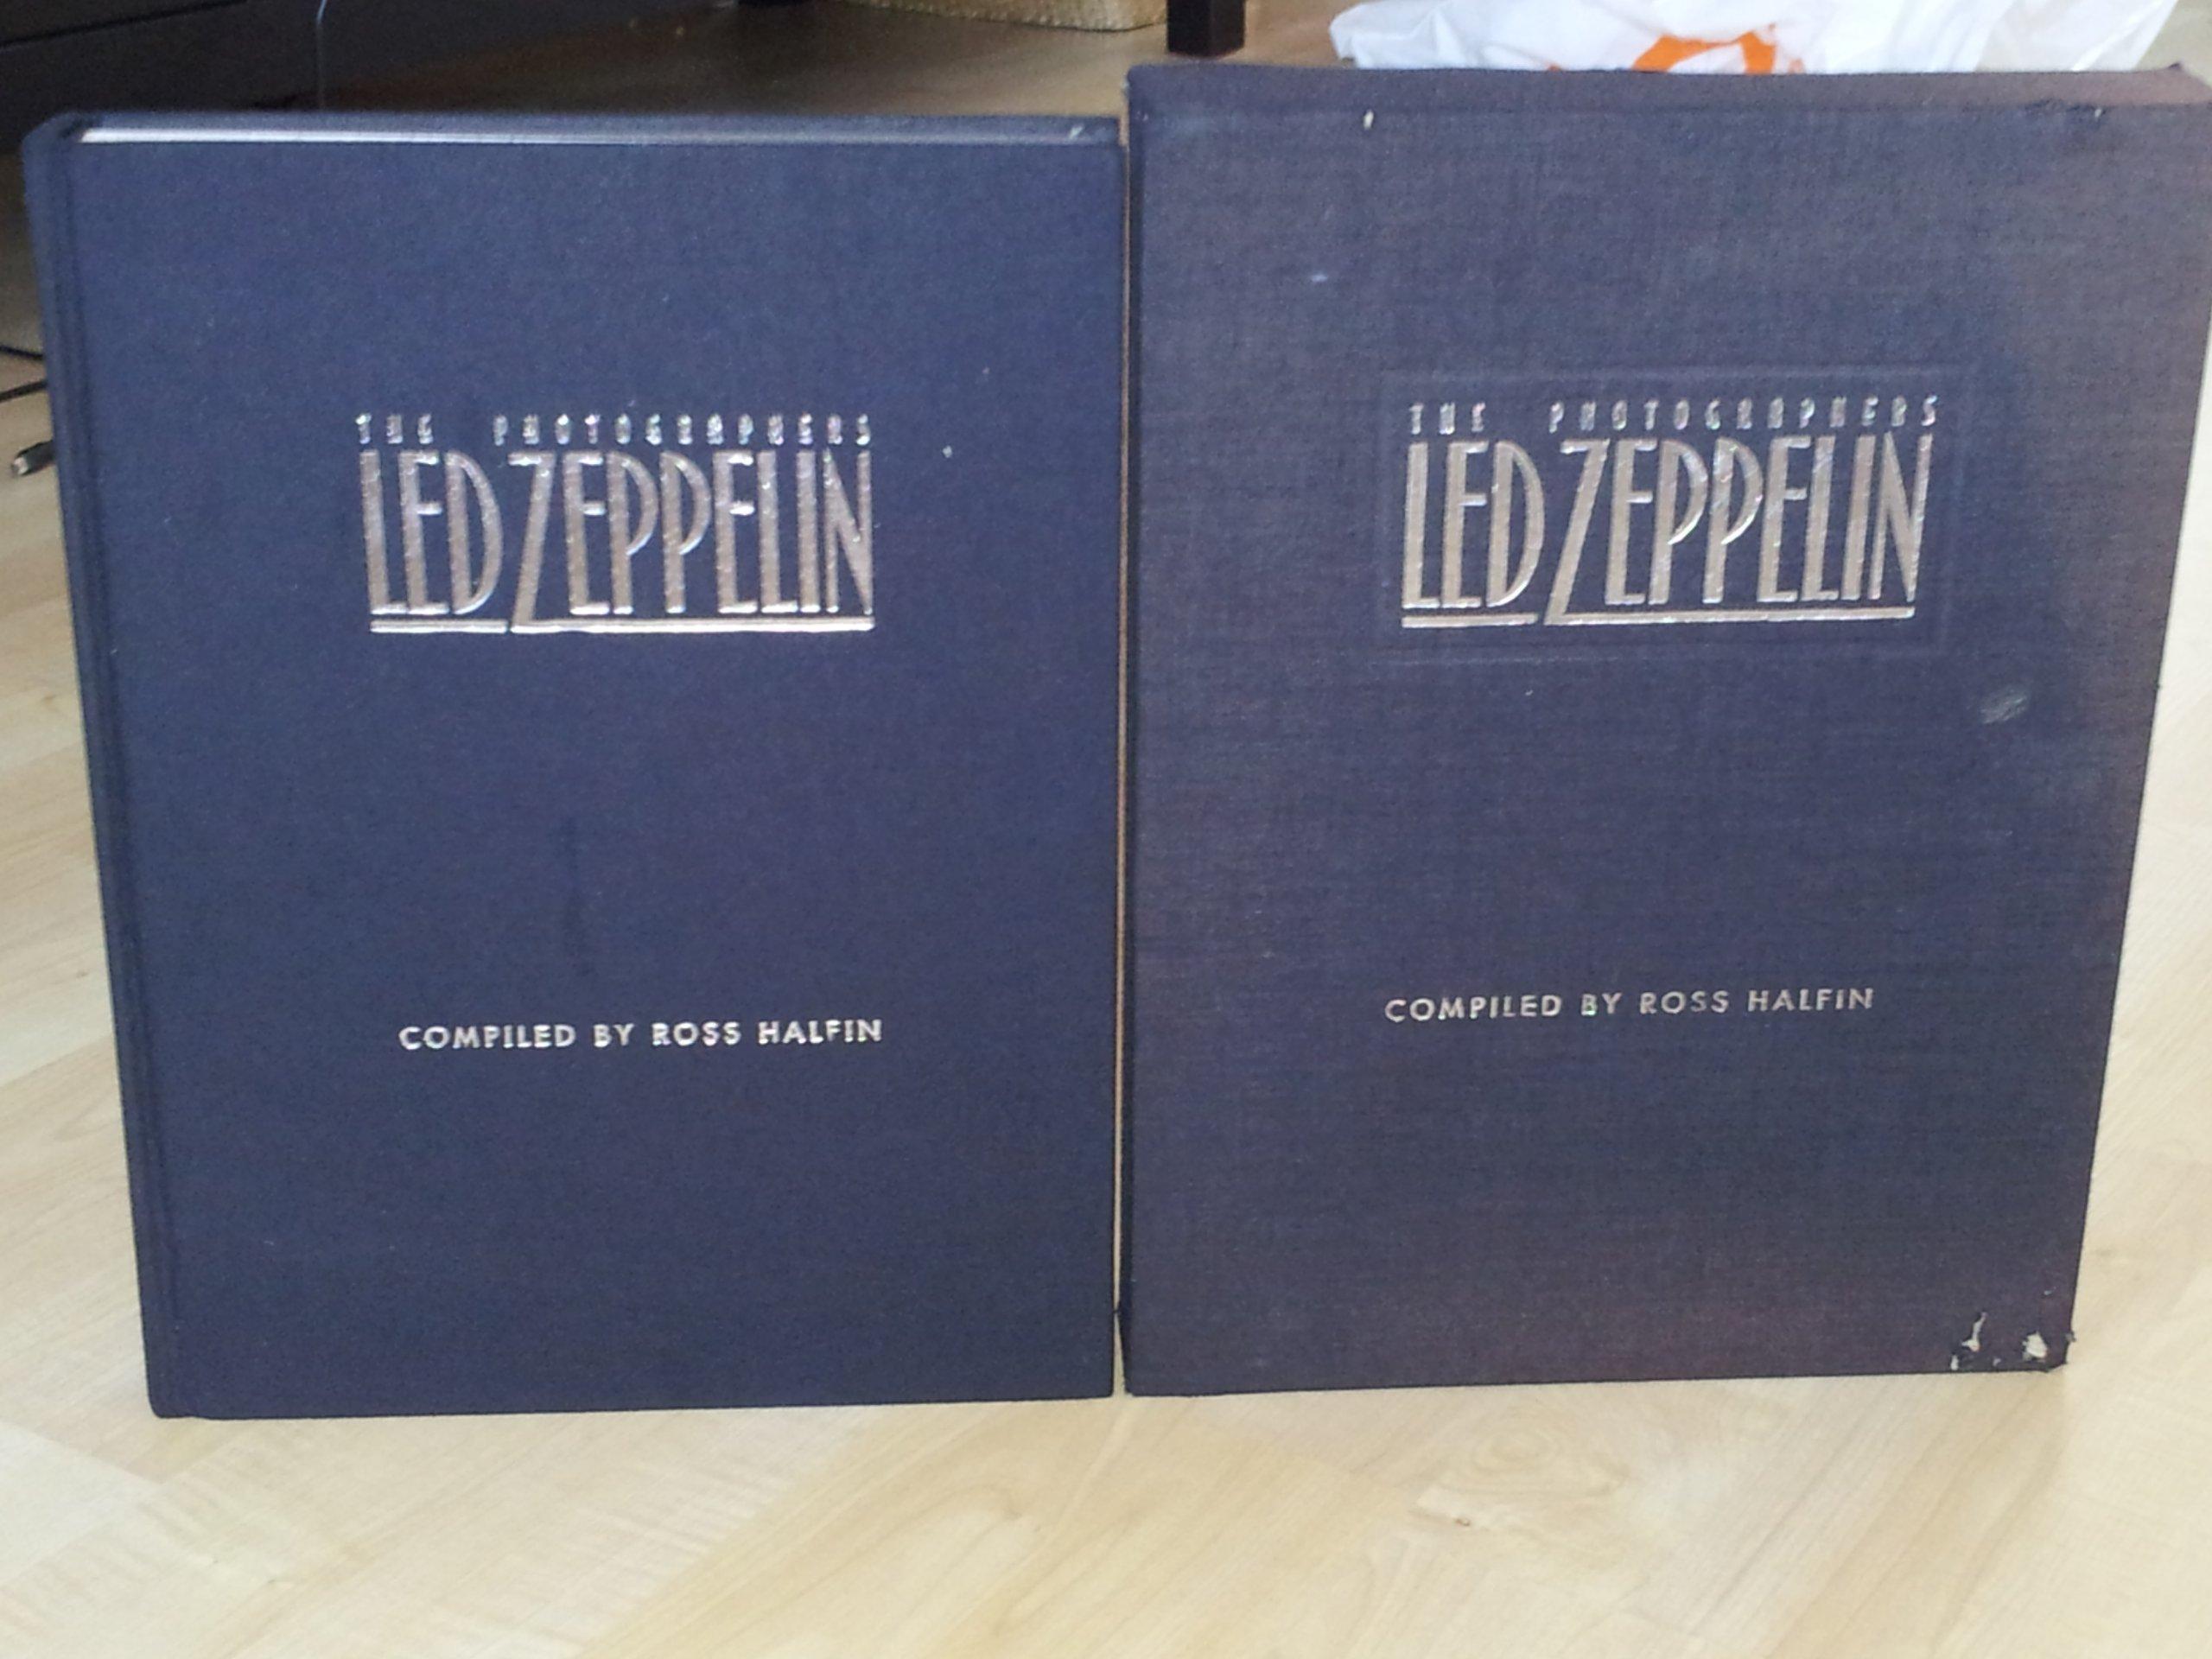 The Photographer's Led Zeppelin